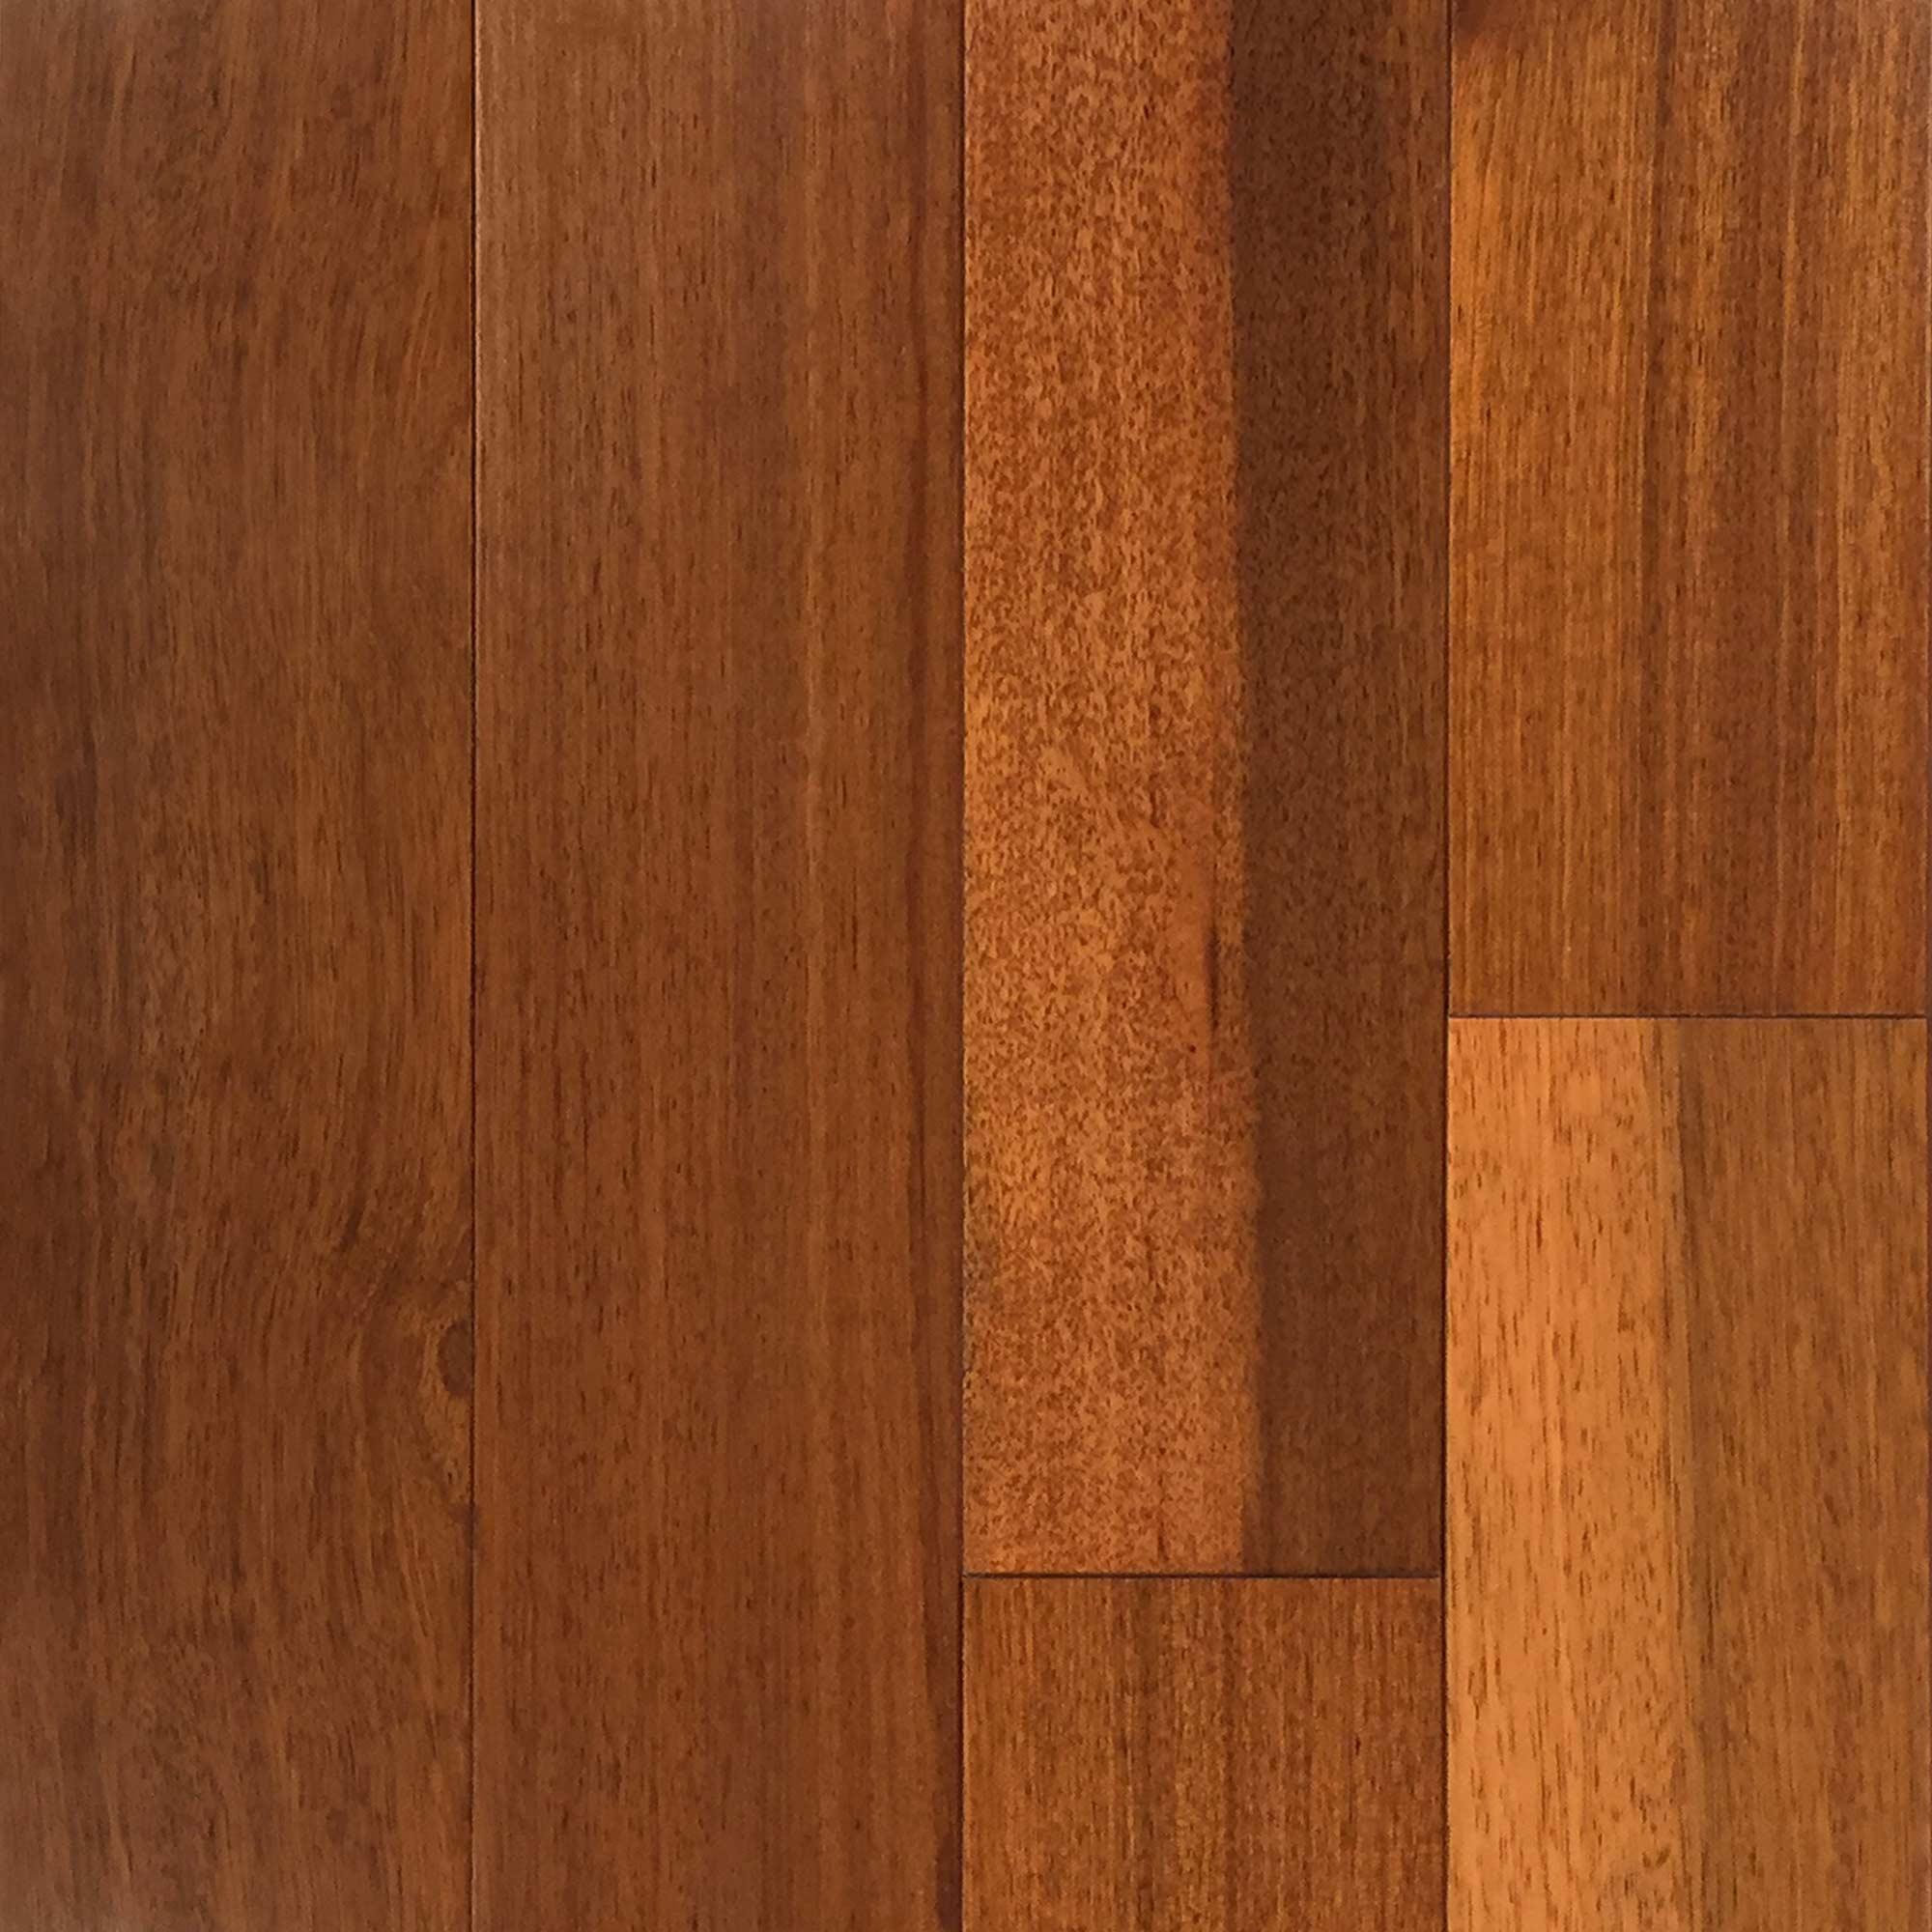 3 4 Hardwood Flooring species acacia color tan dimensions x 4 x rl sold under palmetto road hardwood flooring here Amazon Cherry Natural Hardwood Flooring